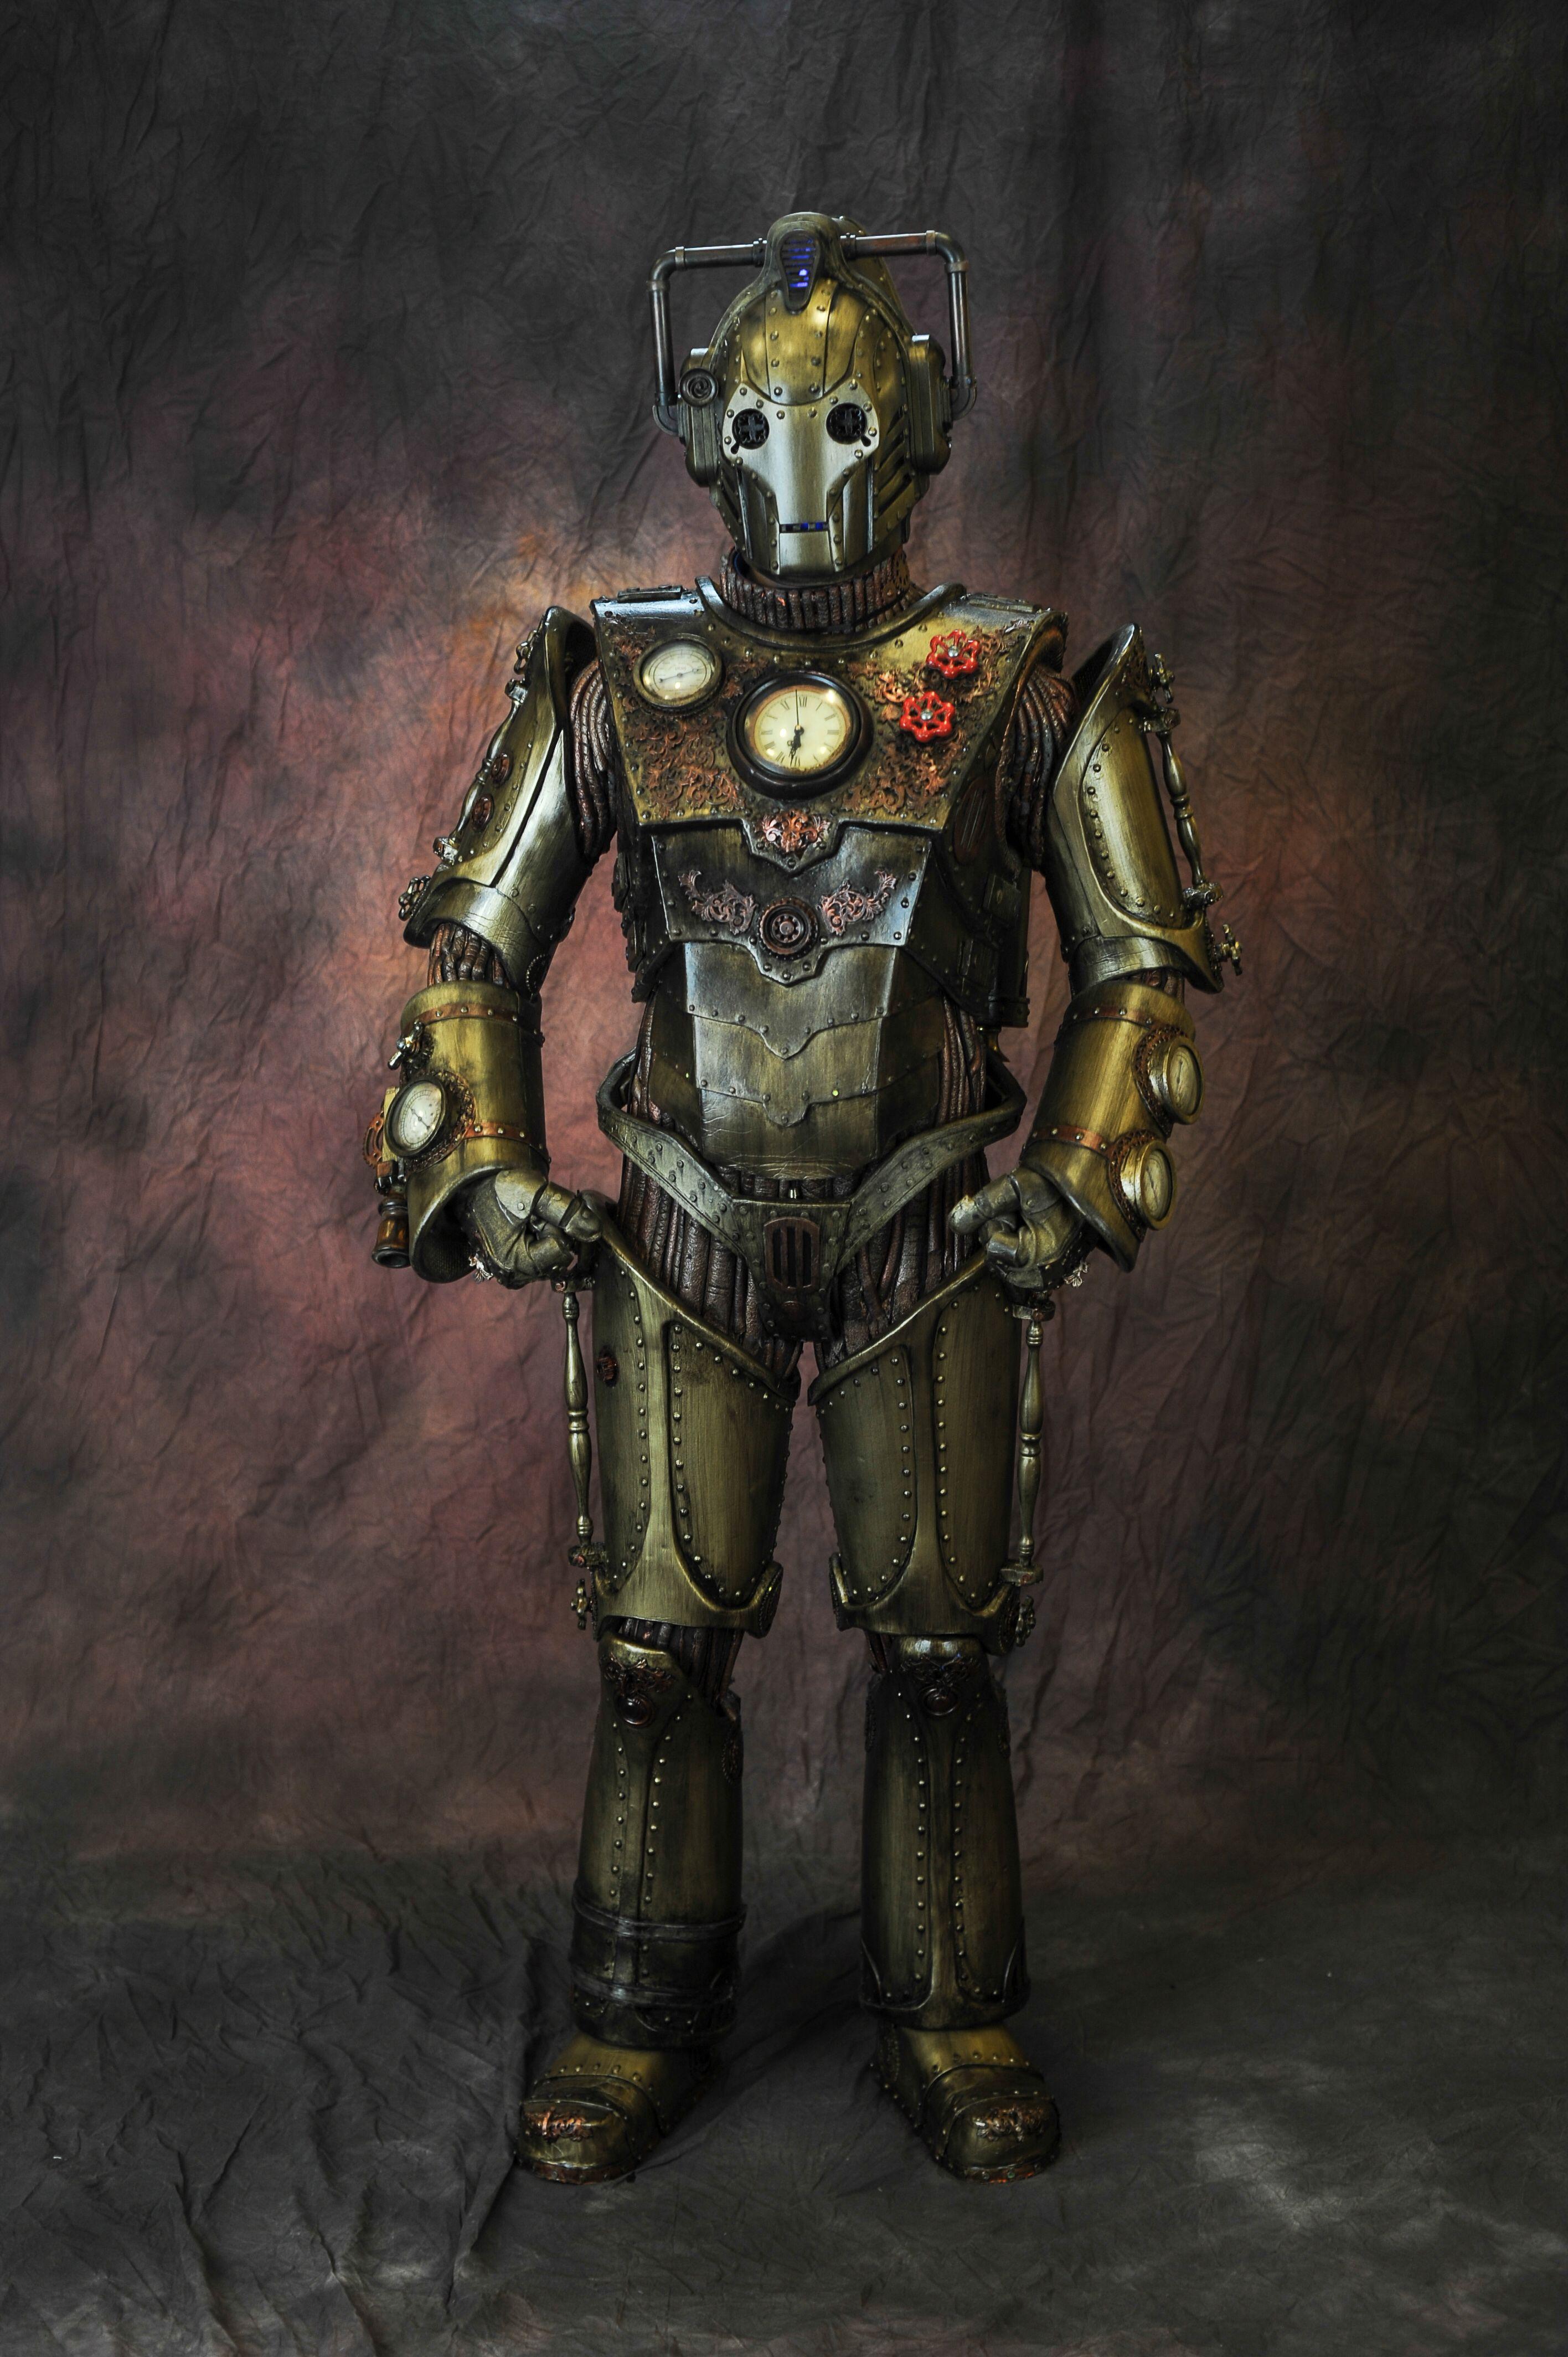 Steampunk Iron Gentleman Cyberman Doctor Costume